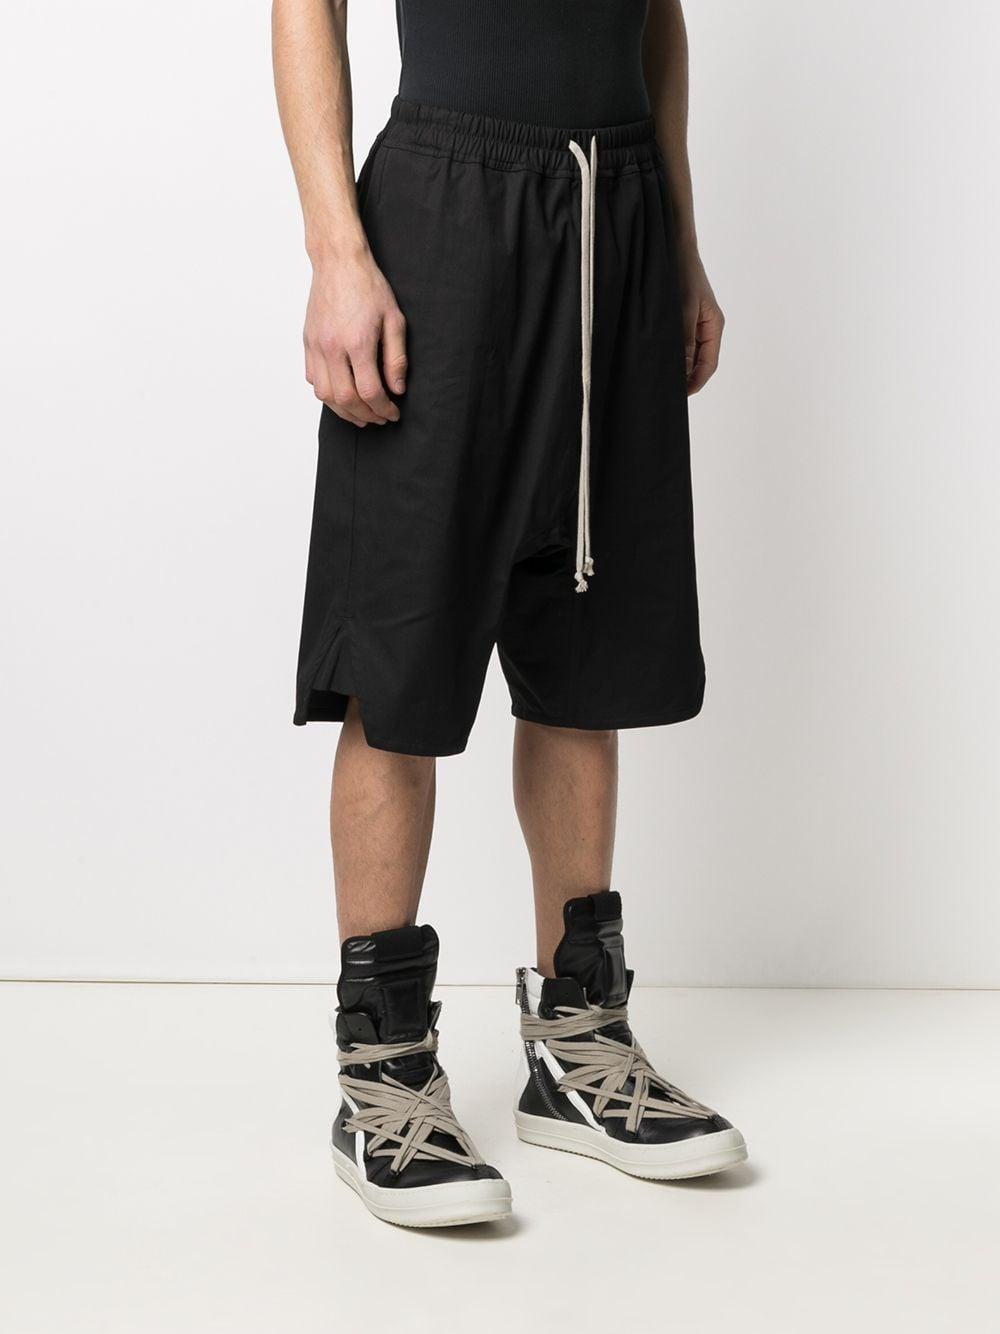 BASKET SWINGERS SHORTS RICK OWENS | Shorts | RU21S6383 TE09